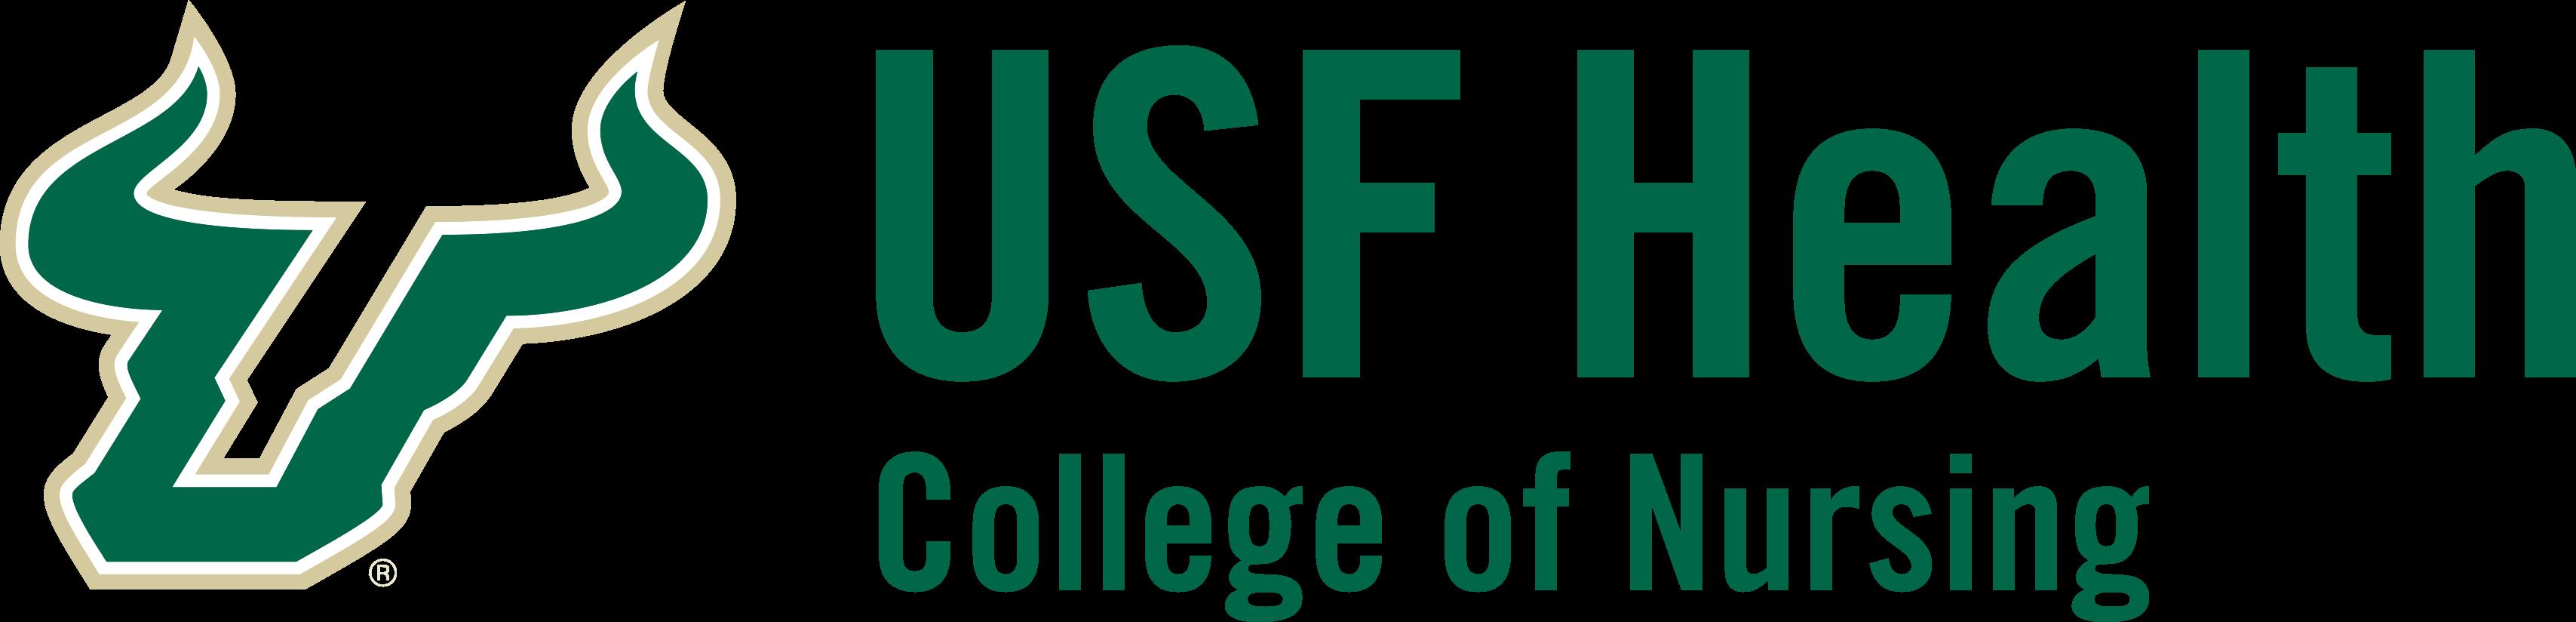 USF College of Nursing